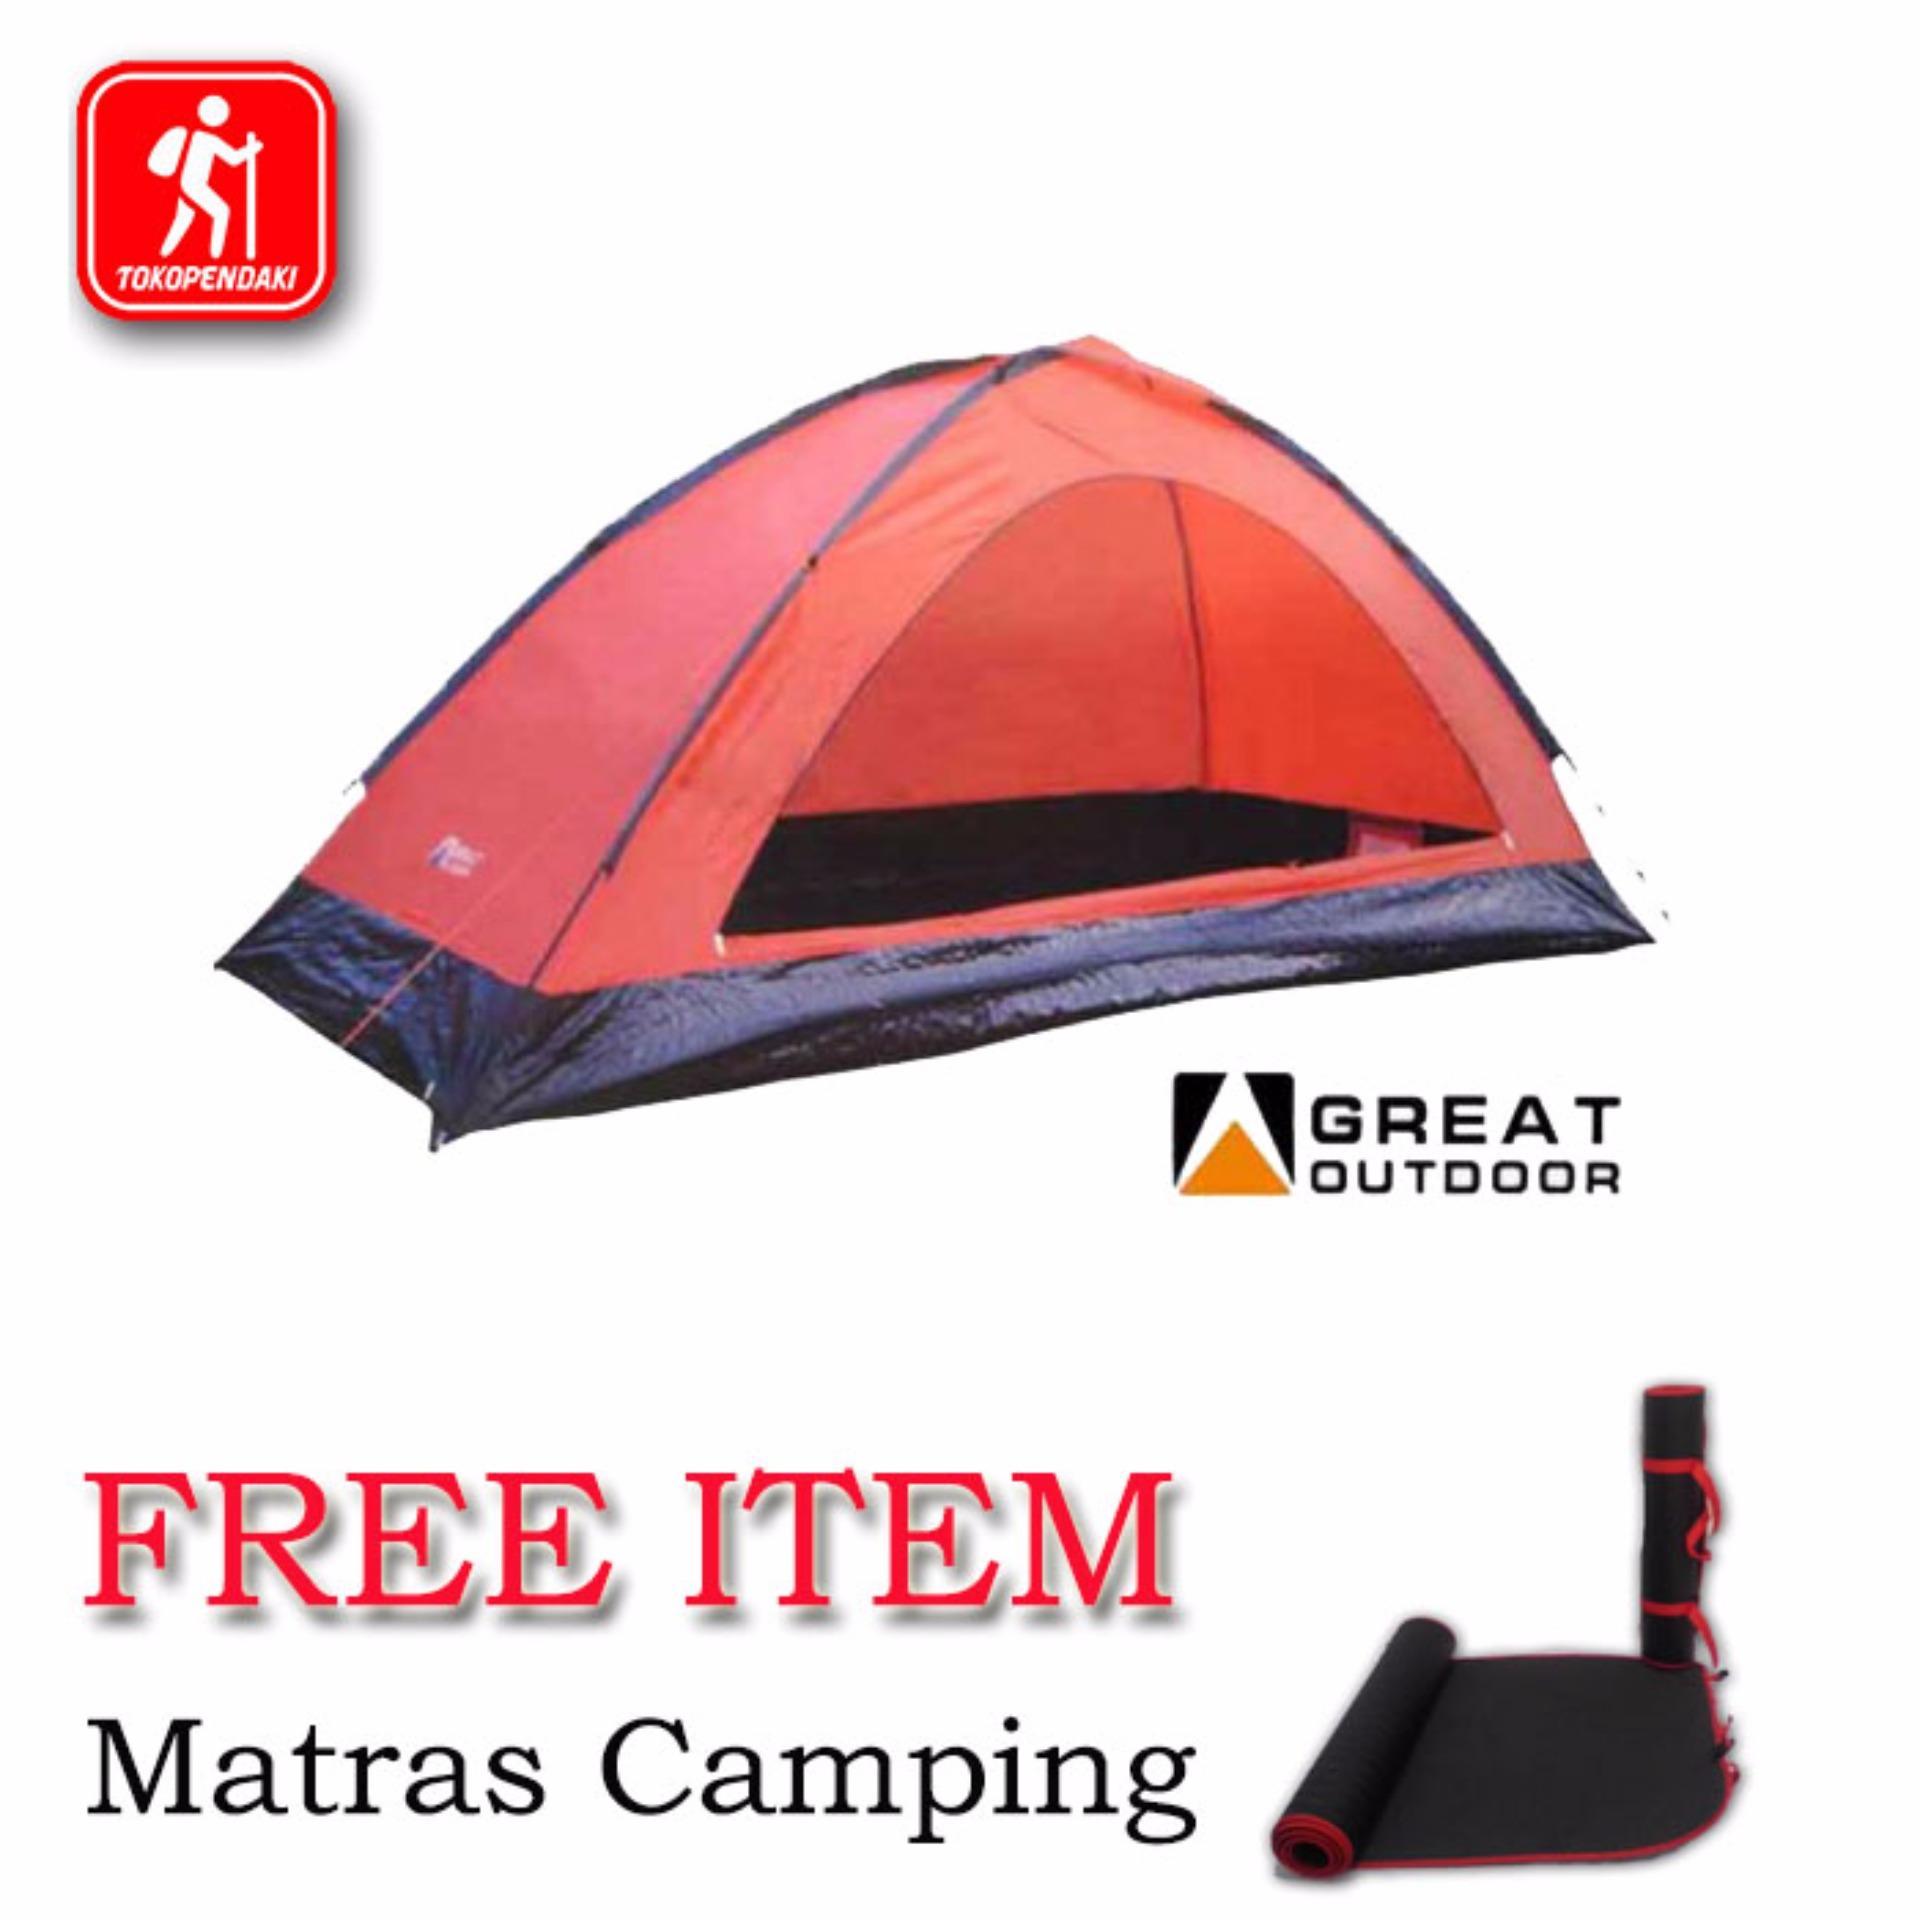 Tenda Great Outdoor Monodome Pro 2 - 3 Orang .